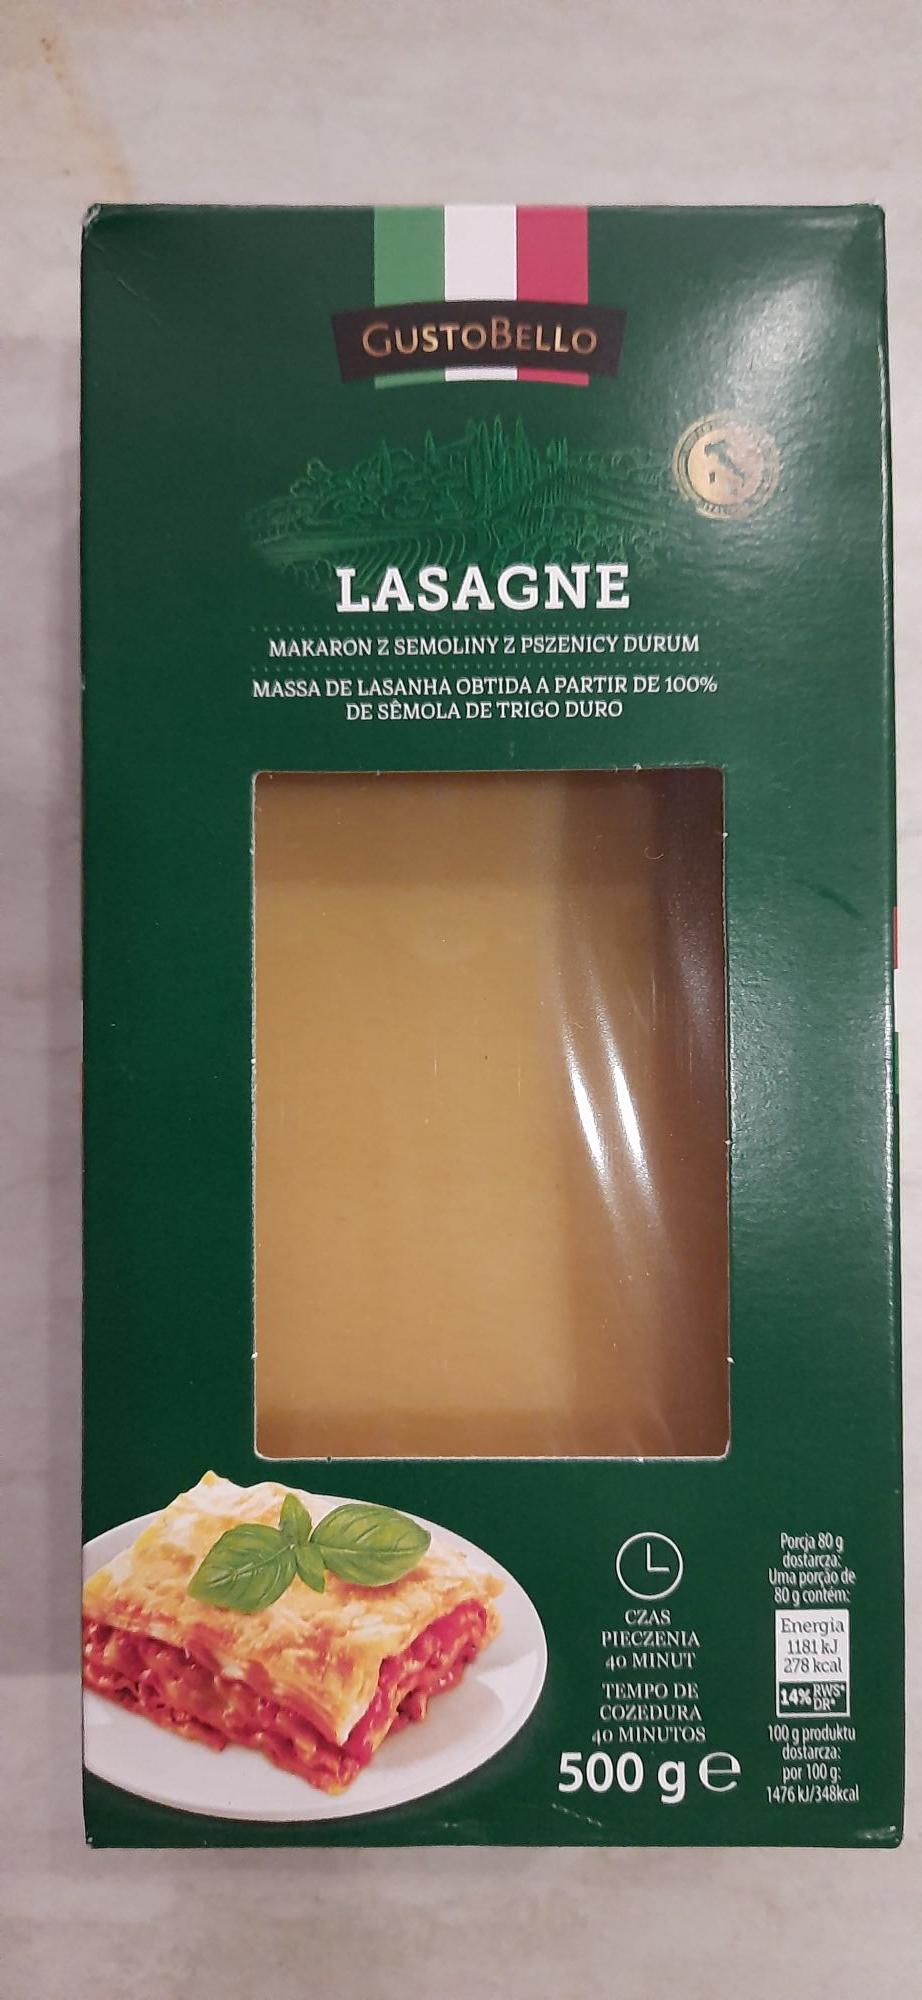 Lasagne makaron 500g, Gustobello, Biedronka